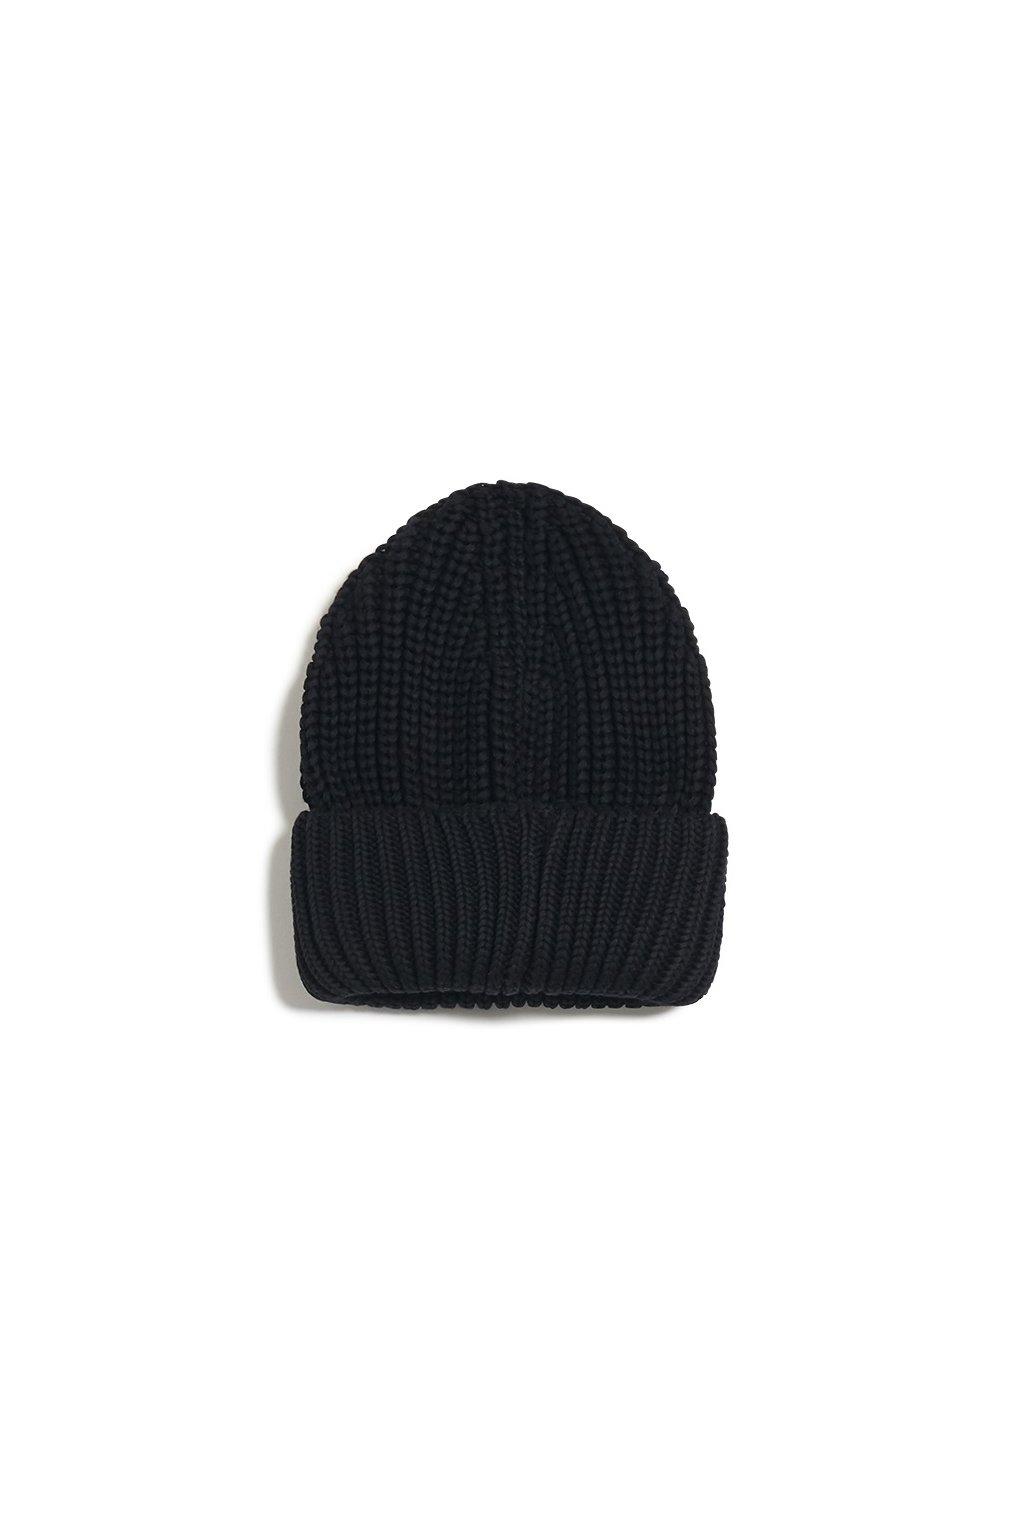 "Dámska čierna čapica ""CAMIRAA black"""